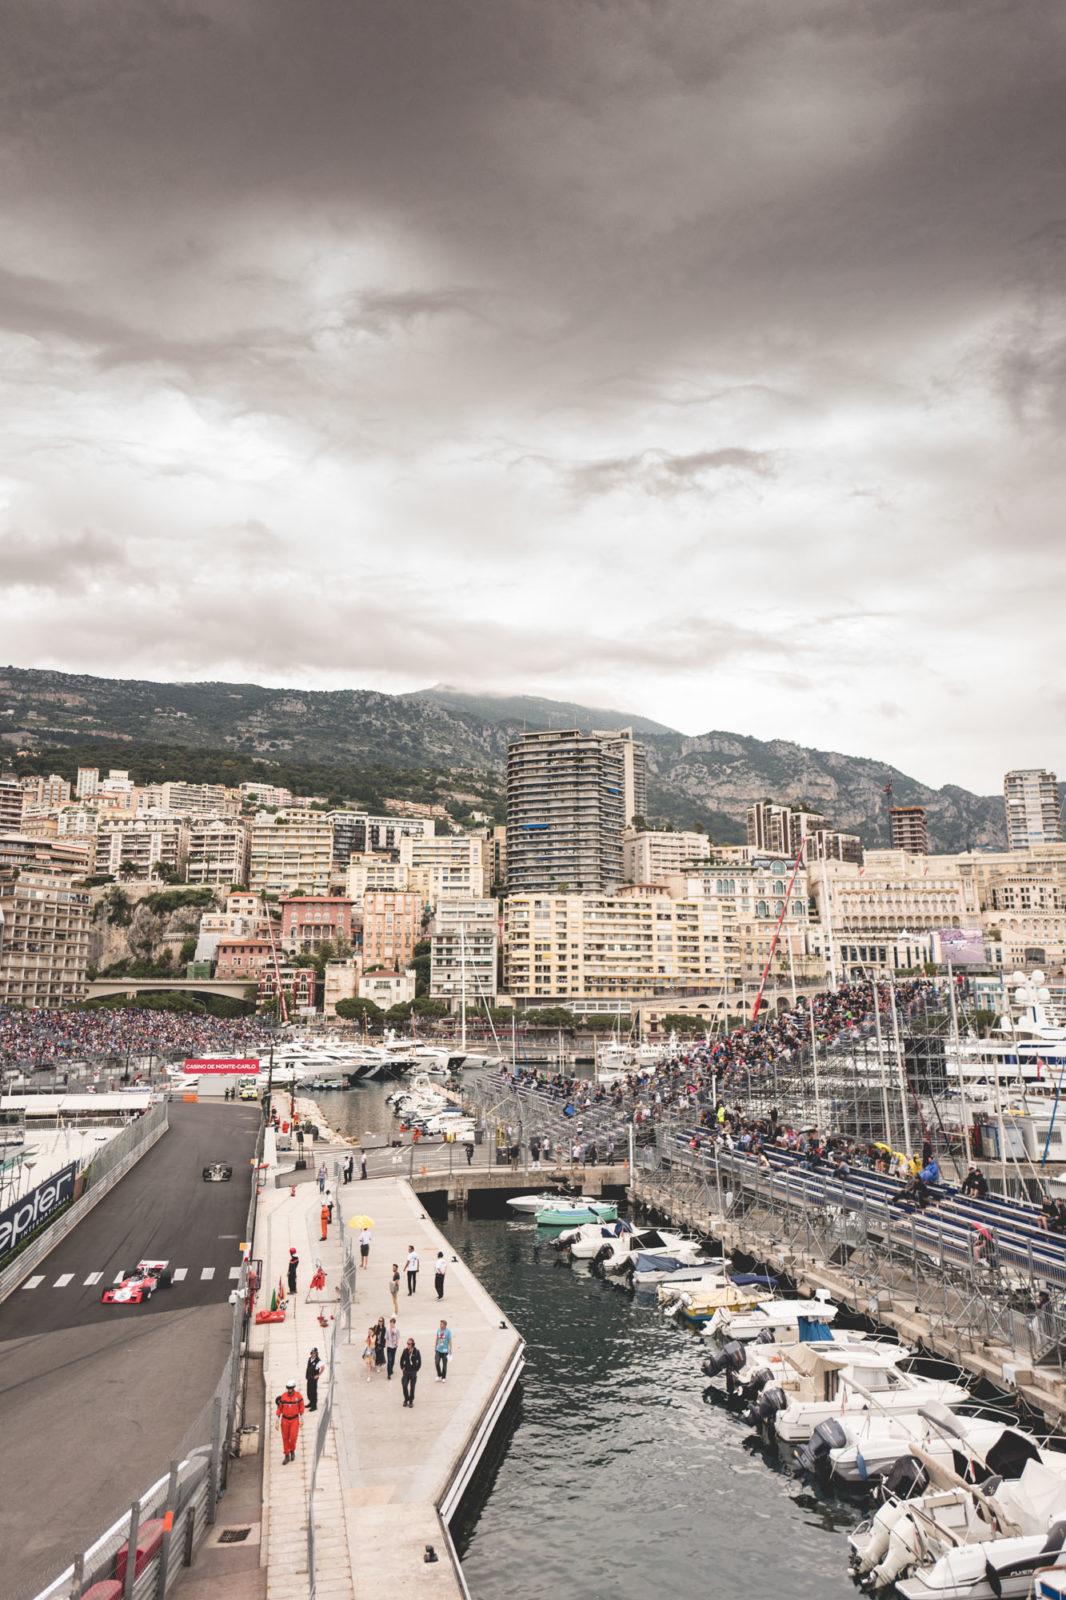 Grand Prix de Monaco Historique - Monaco